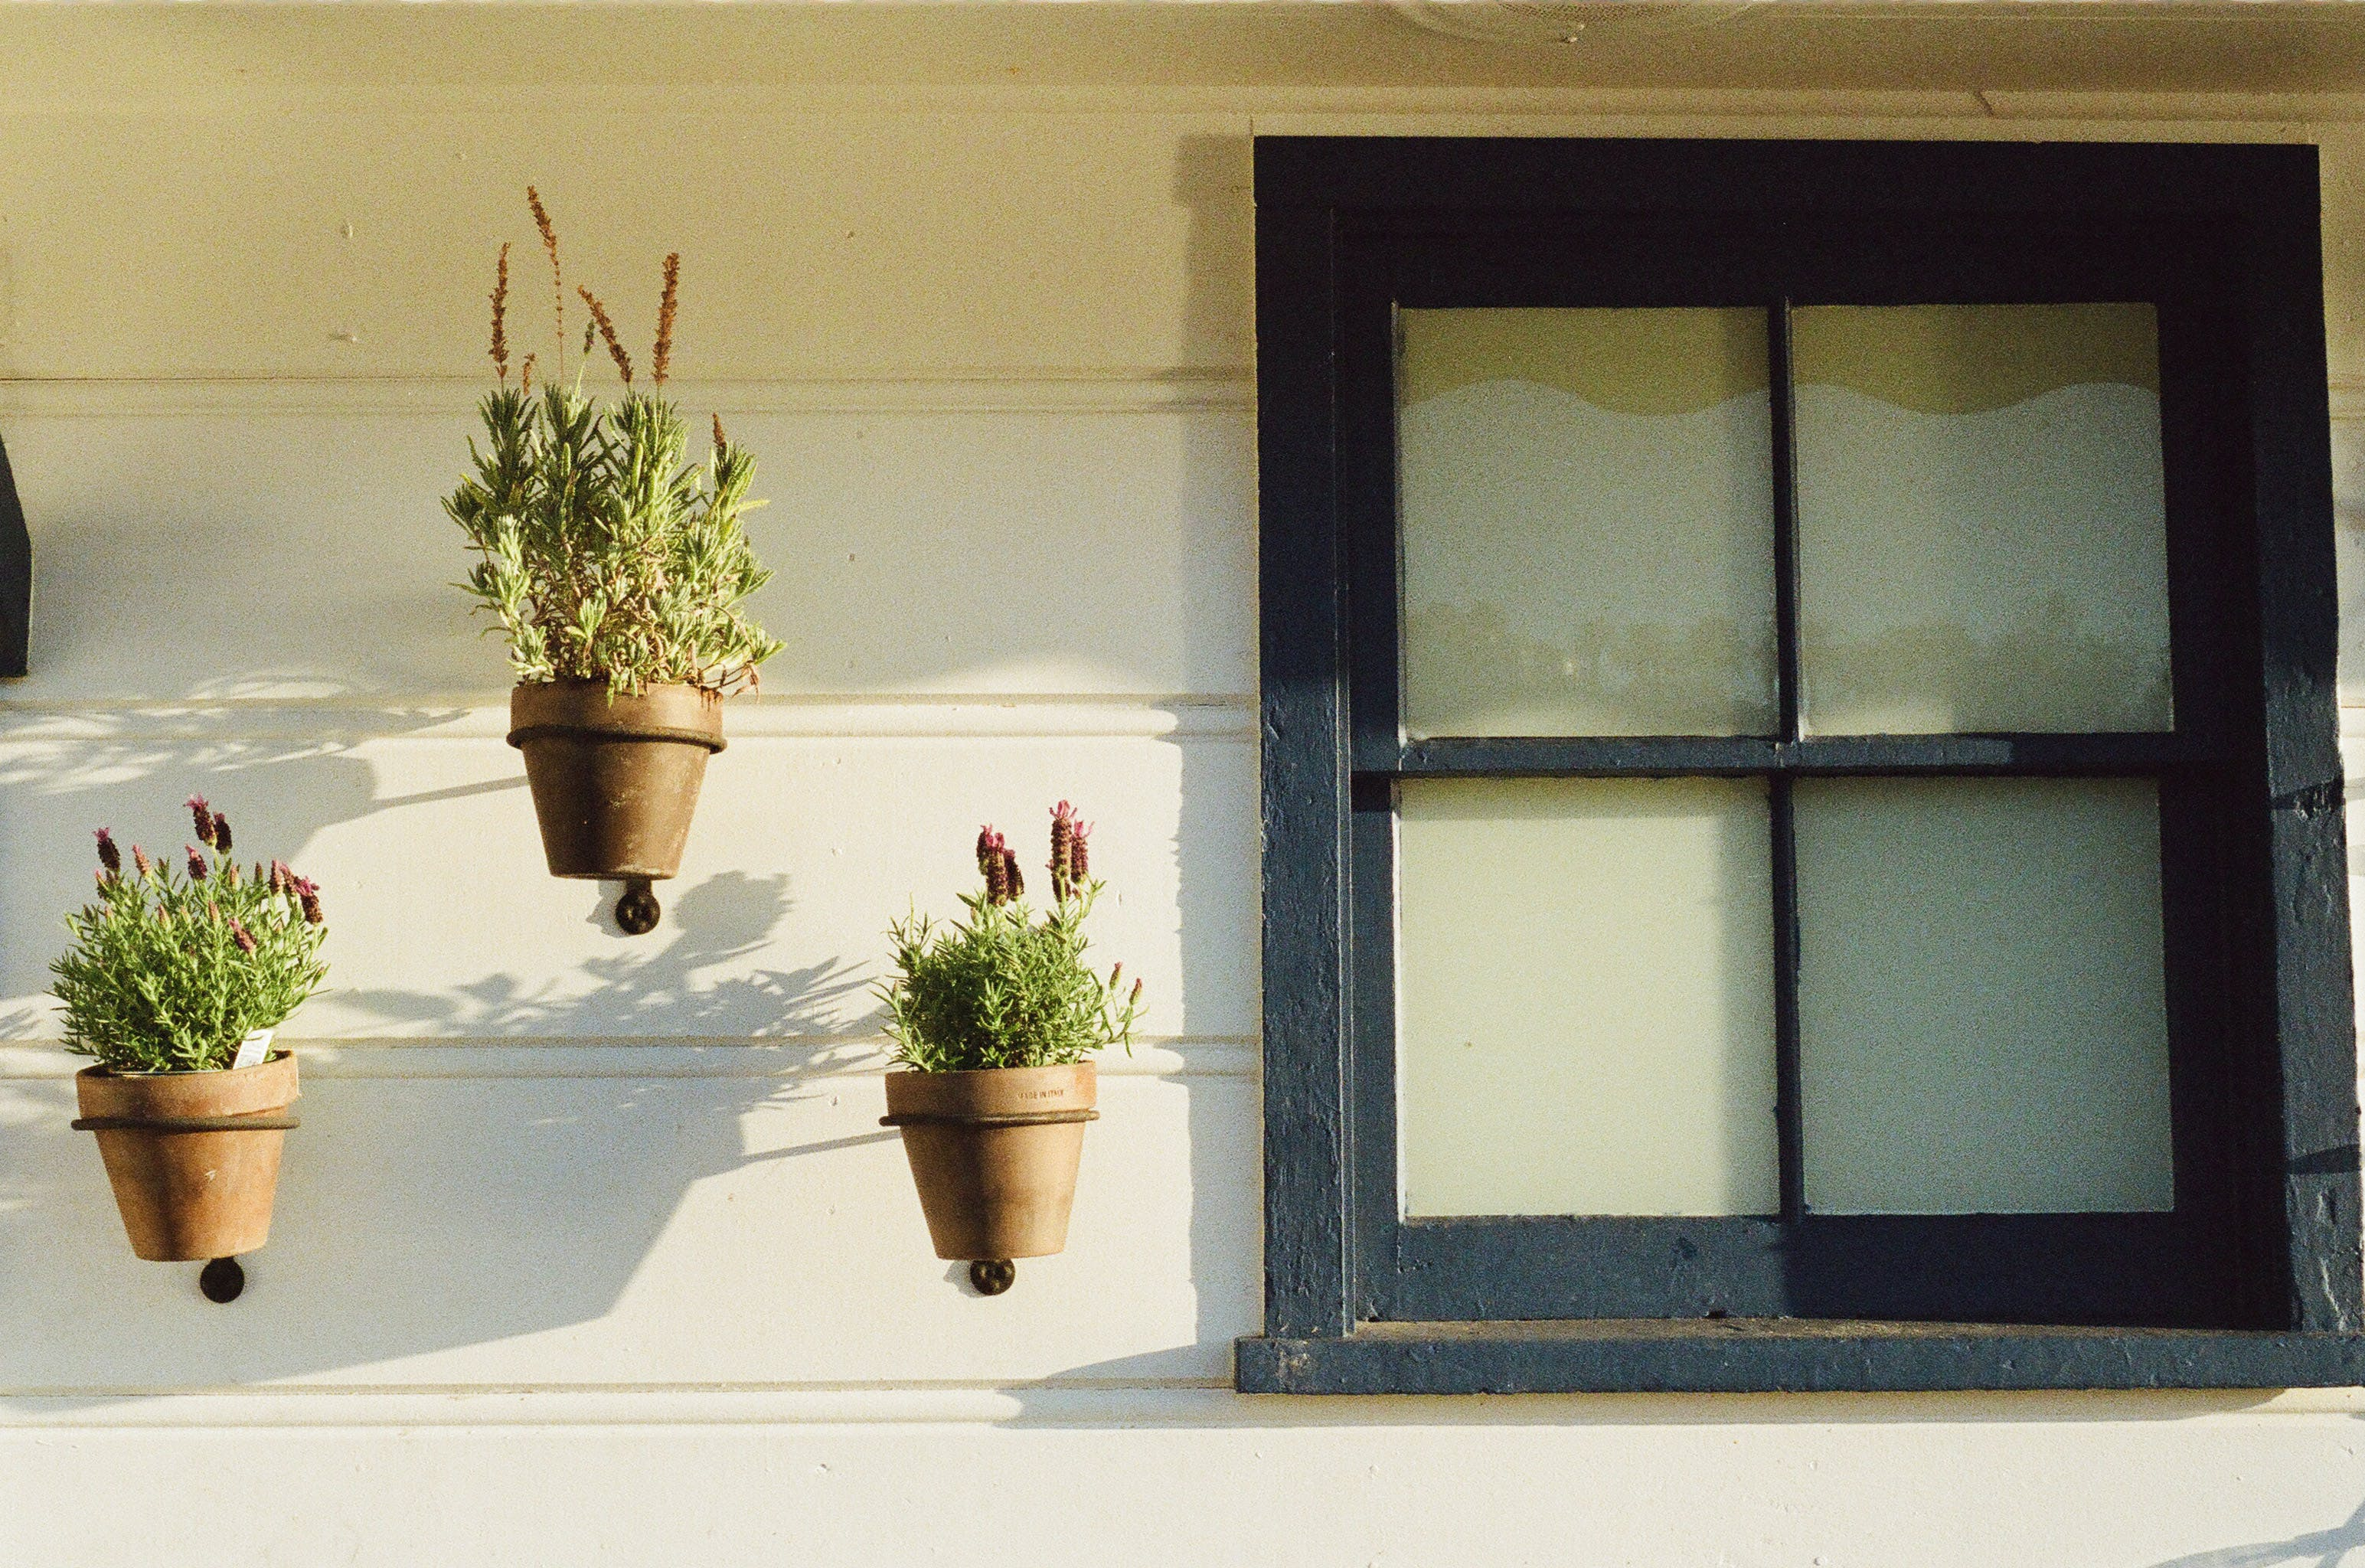 Free stock photo of house, window, flowerpots